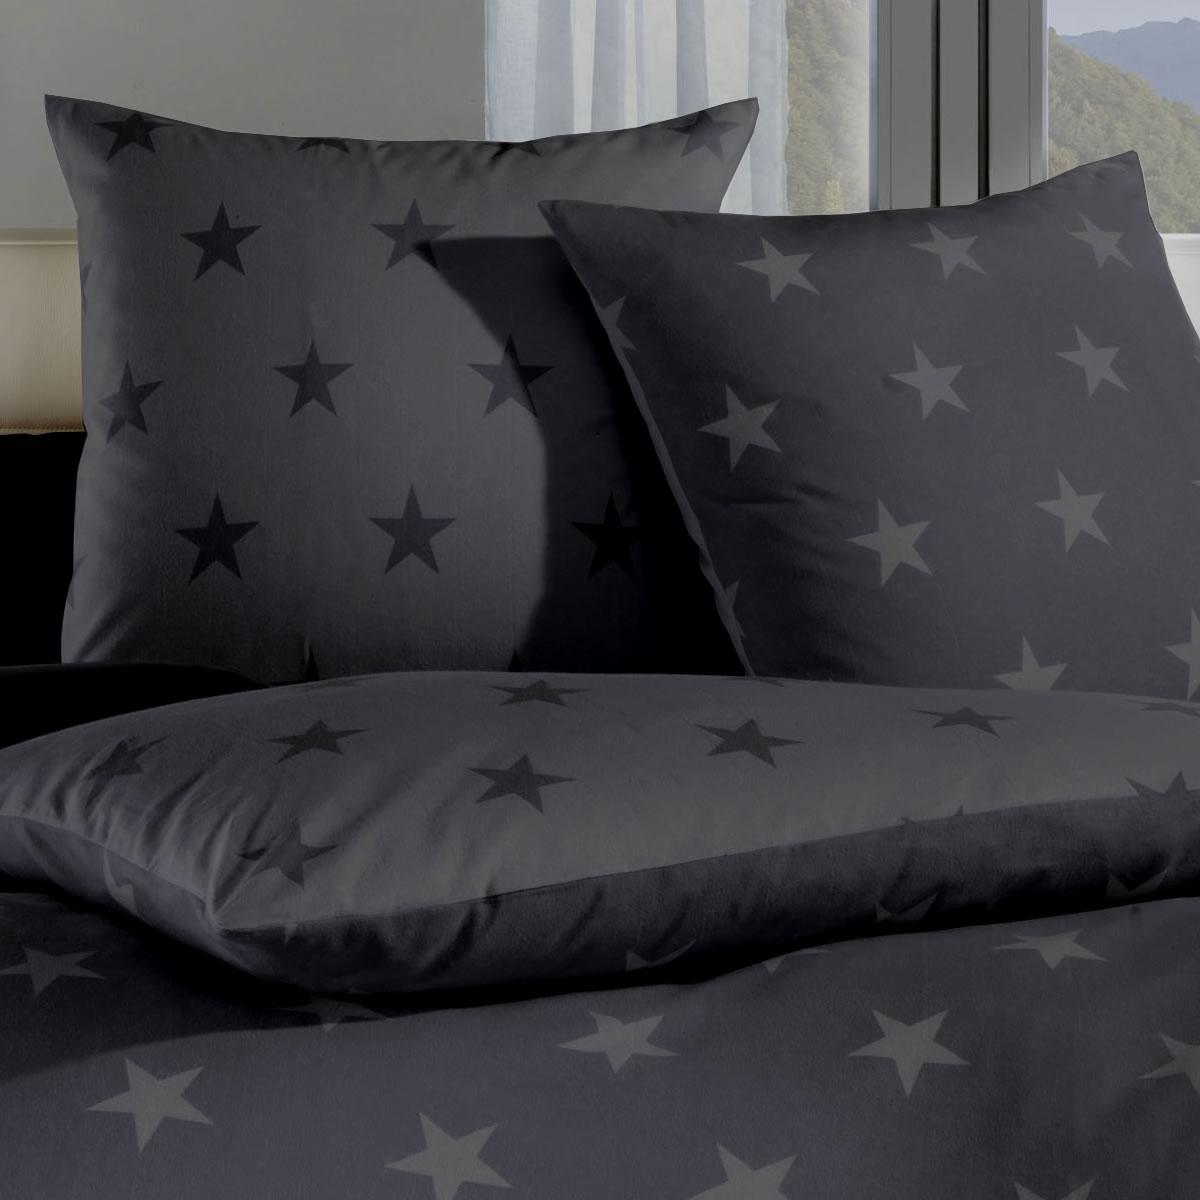 kaeppel fein biber wende bettw sche design stars zinn 32779 sterne. Black Bedroom Furniture Sets. Home Design Ideas